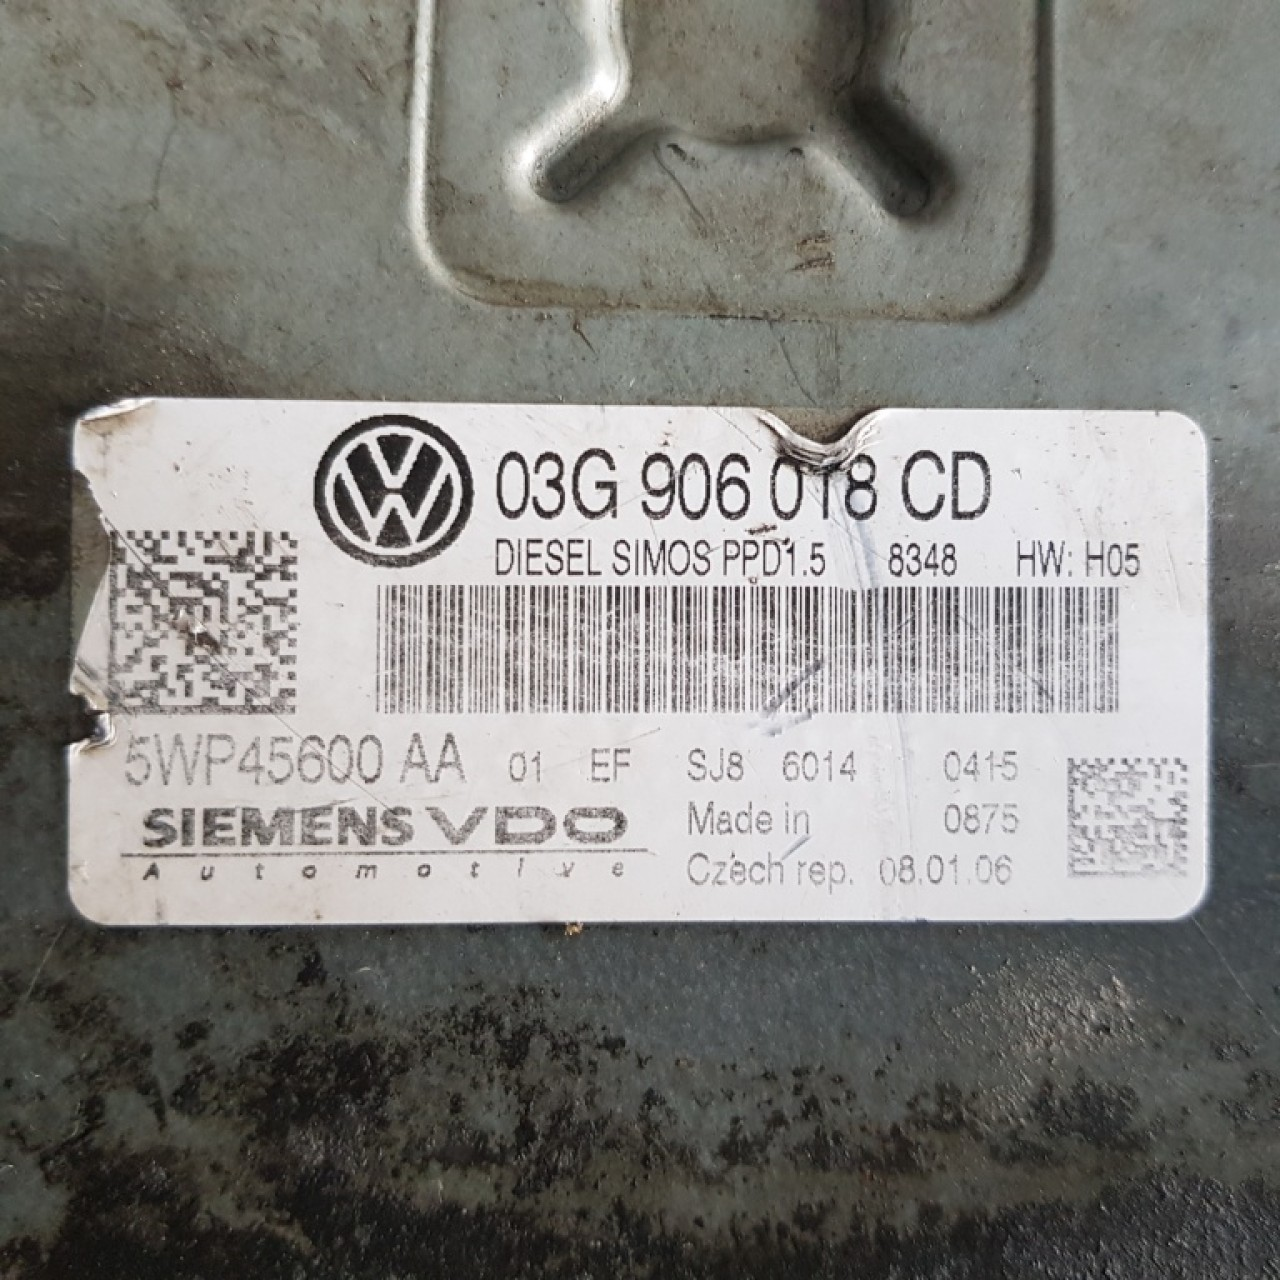 Calculator motor / Ecu VW Passat B6 2.0TDi 03g906018cd